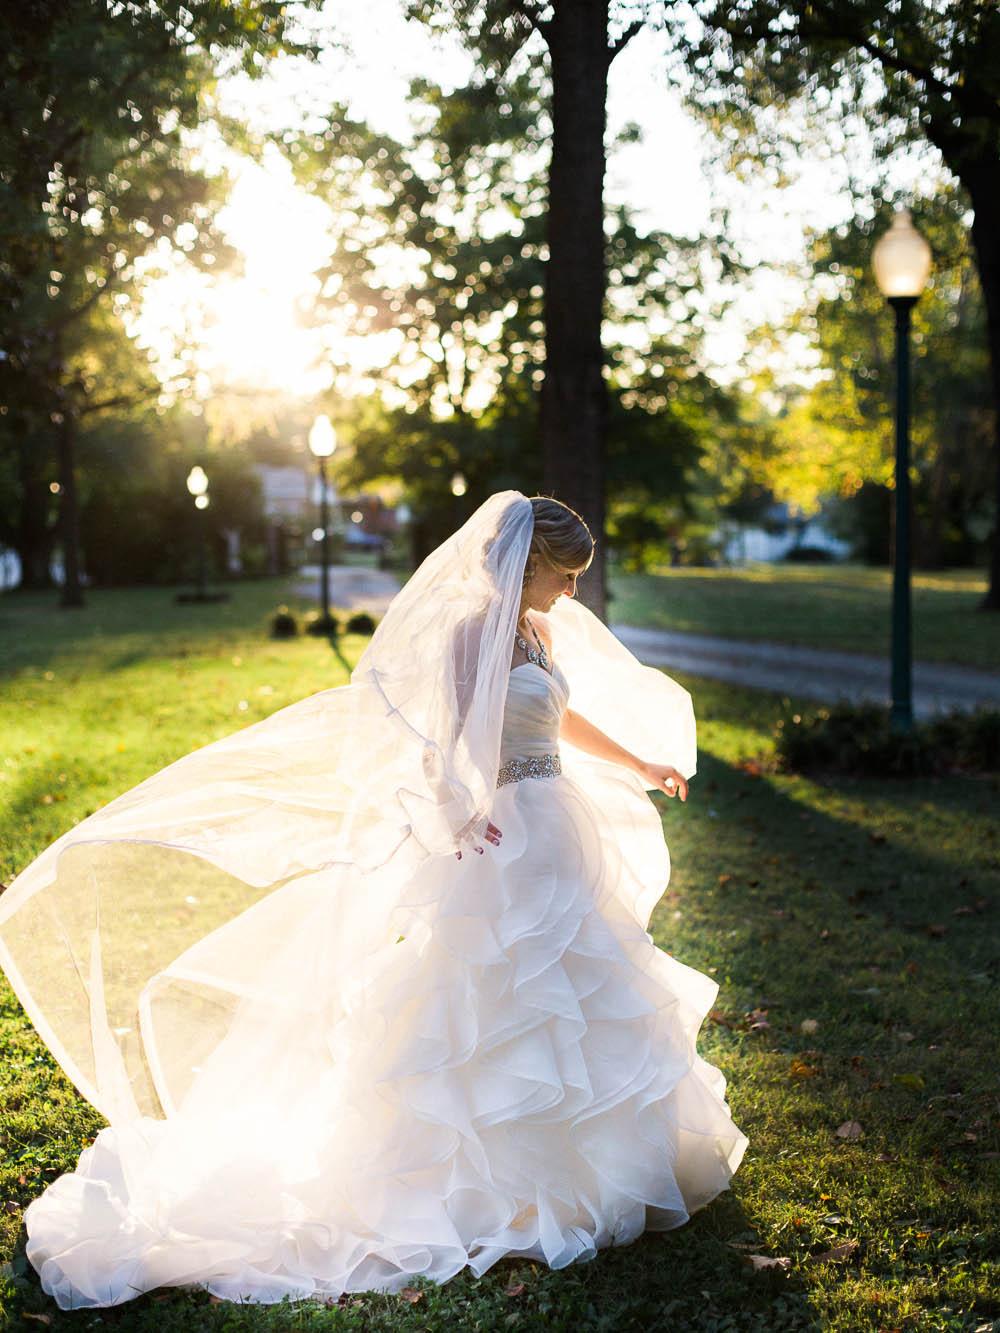 riverwood mansion film wedding photographer natural documentary ©2016abigailbobophotography-28.jpg